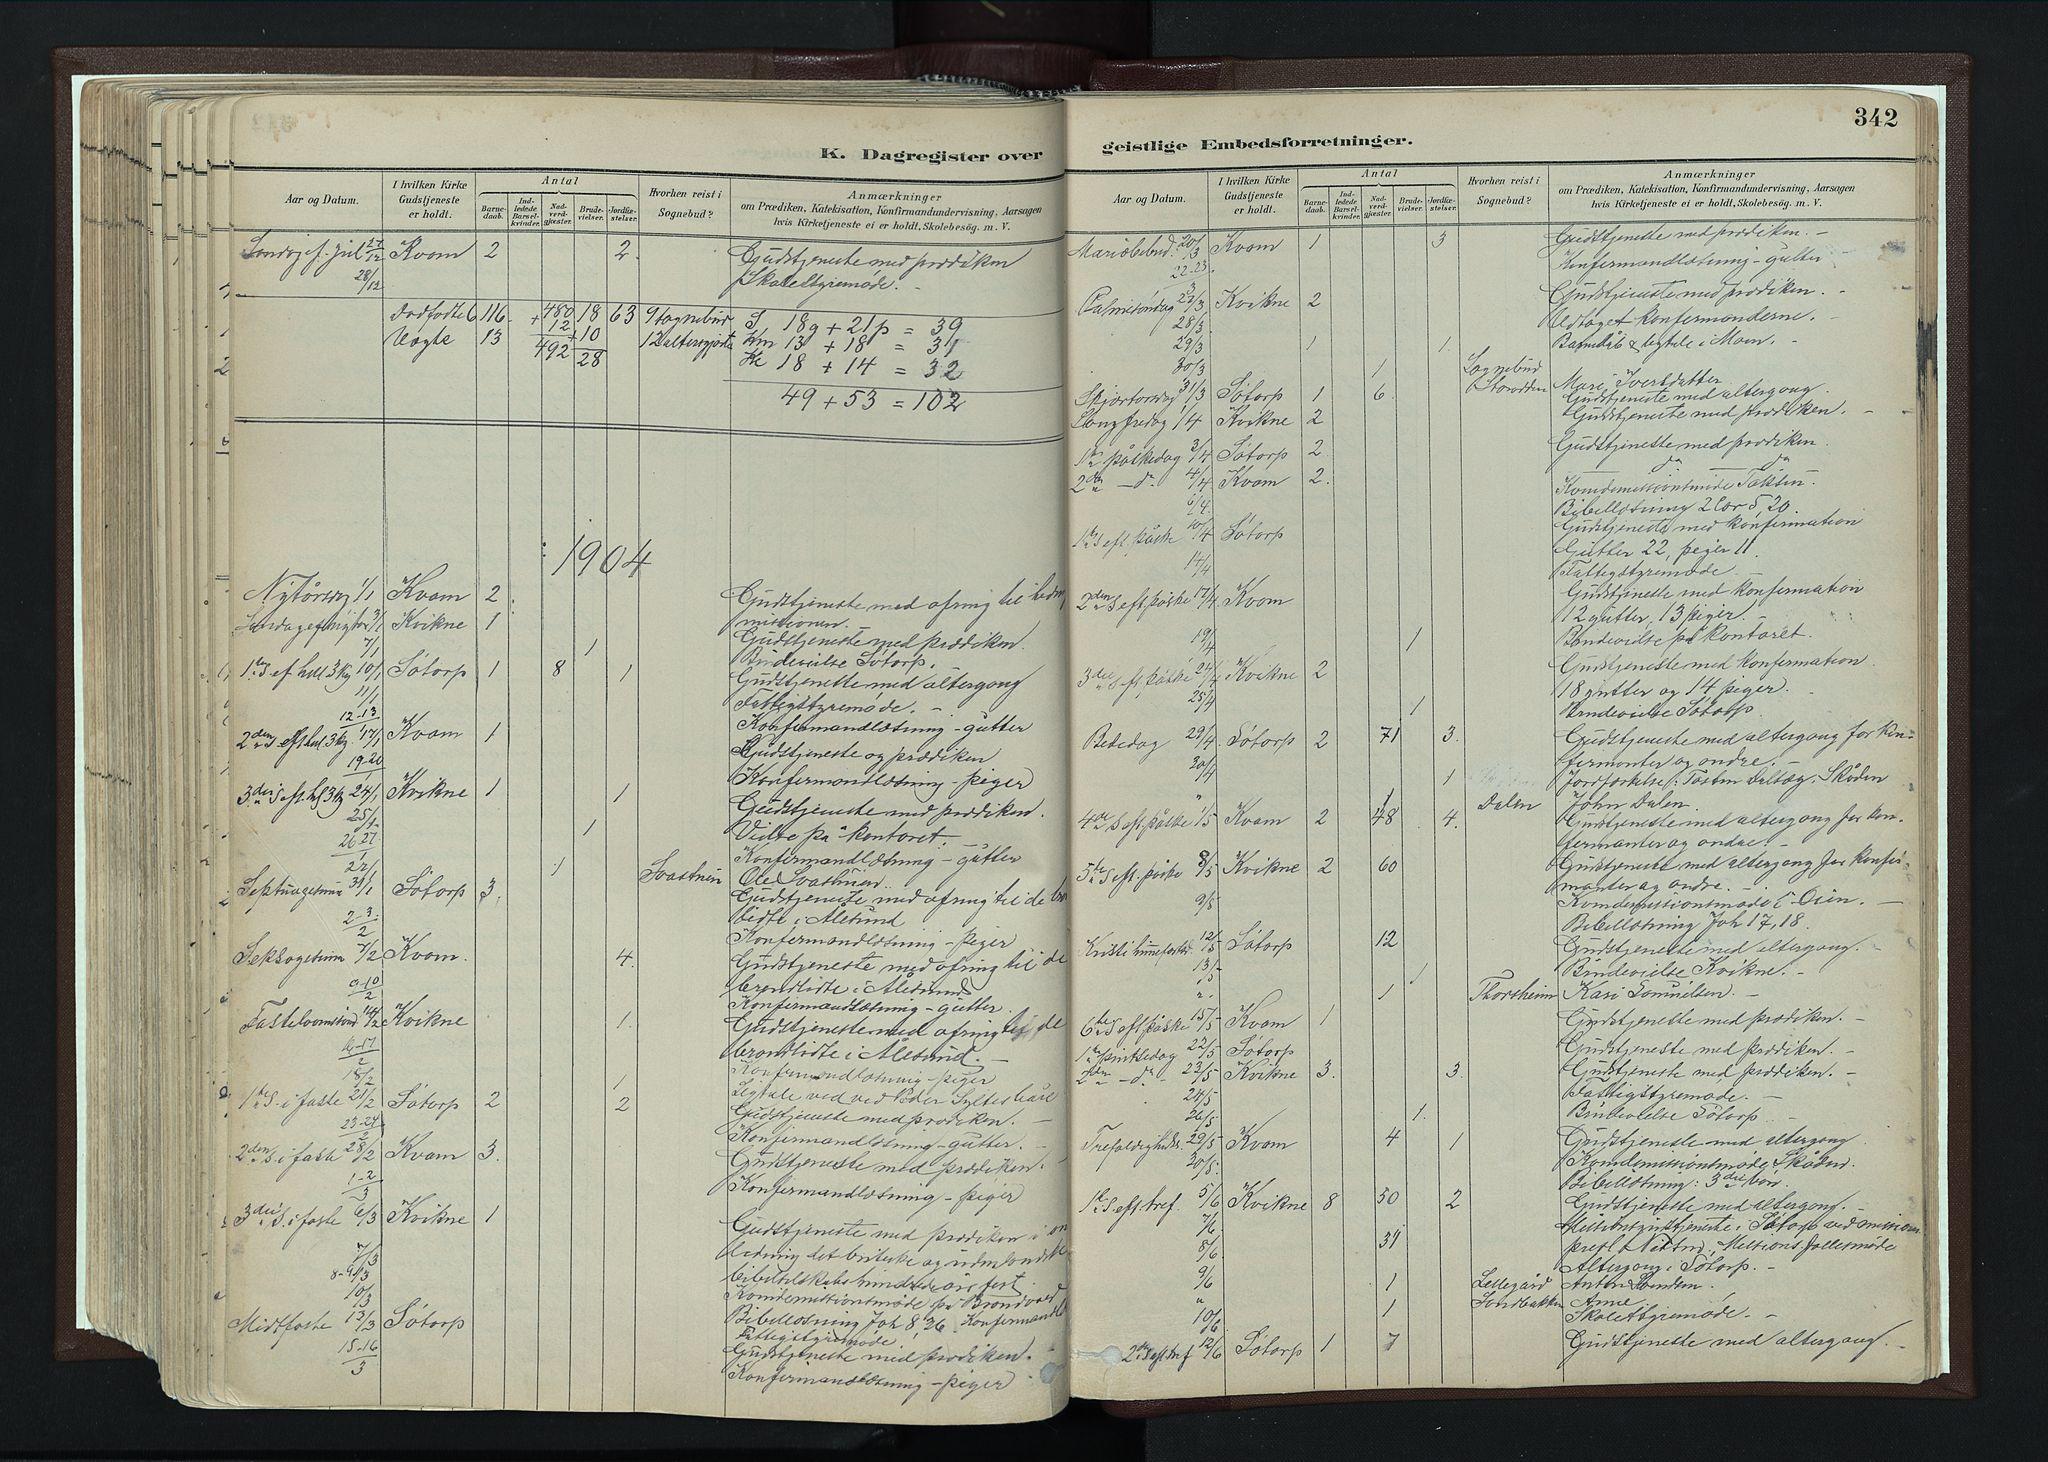 SAH, Nord-Fron prestekontor, Ministerialbok nr. 4, 1884-1914, s. 342